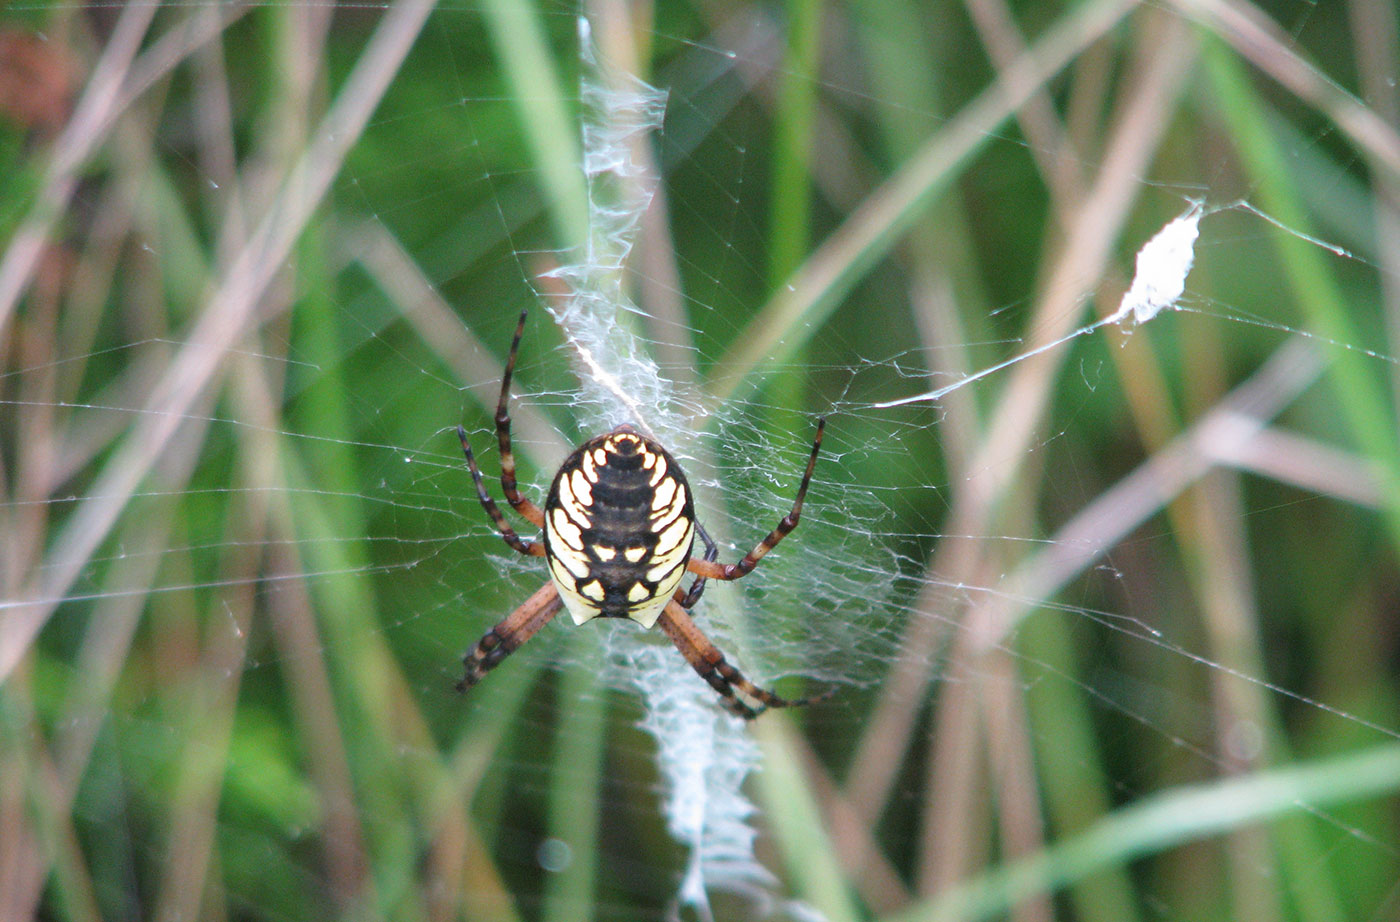 Black and yellow garden spider